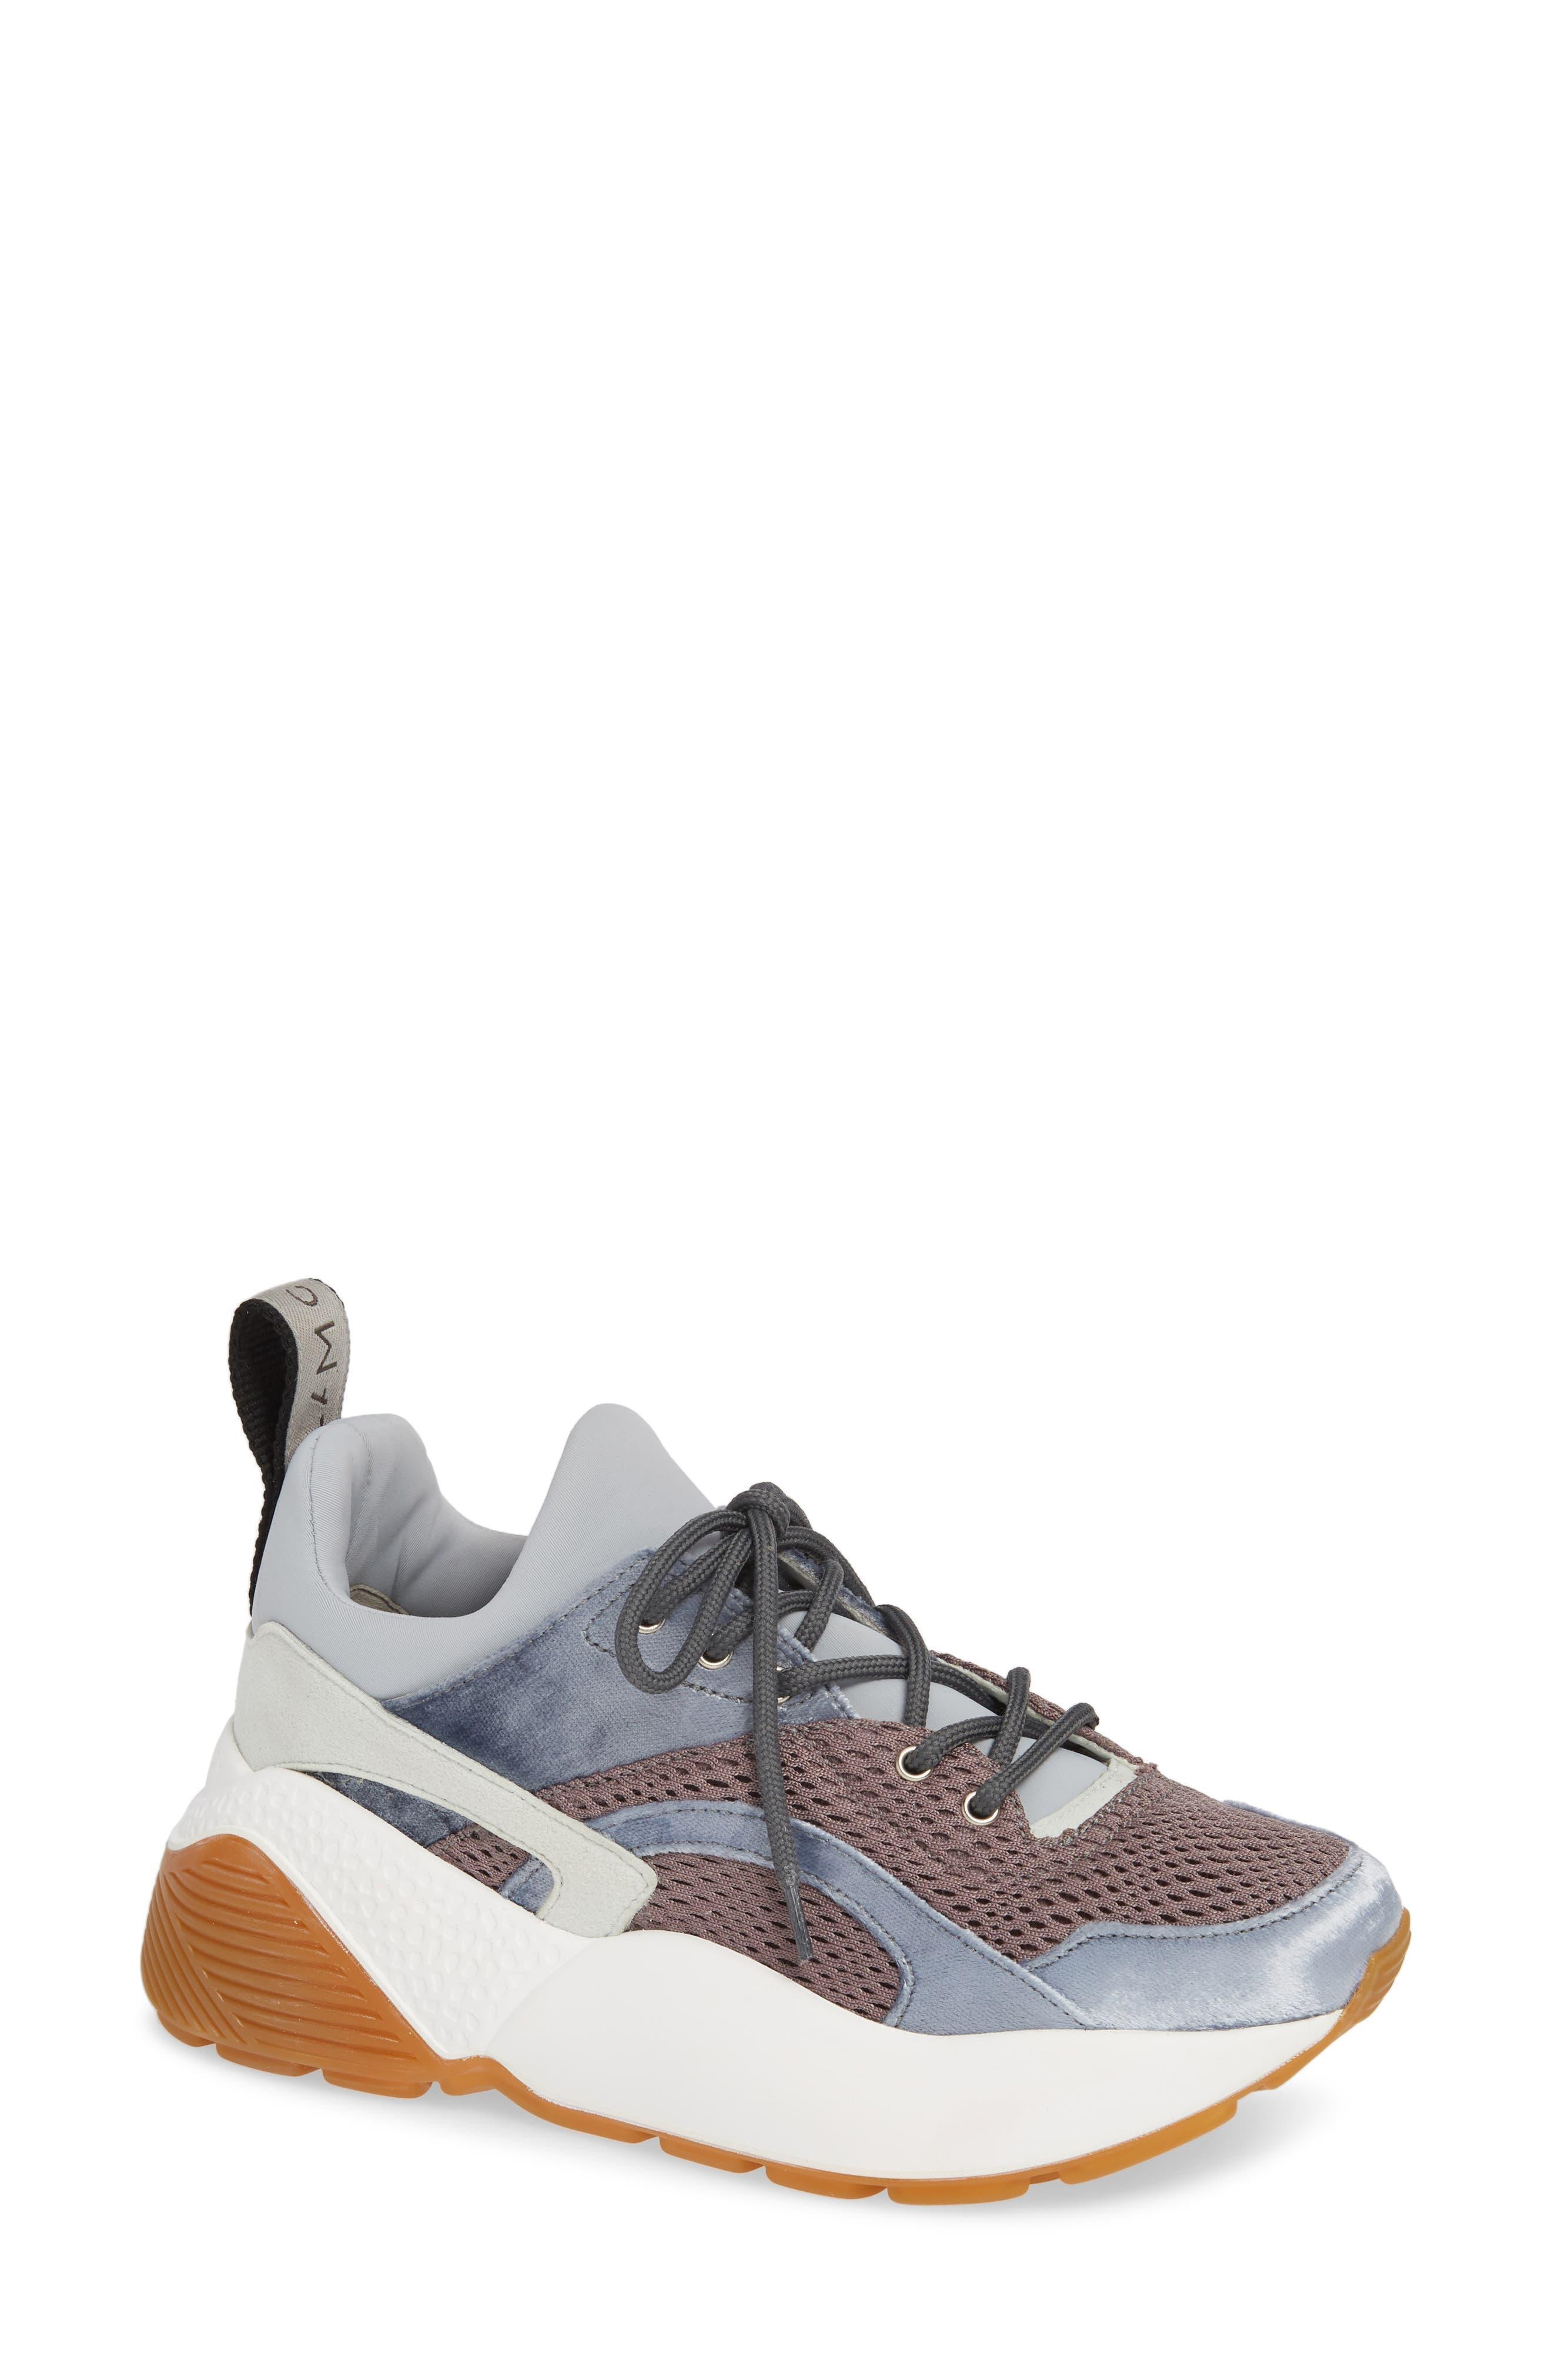 Eclypse Lace-Up Sneaker,                             Main thumbnail 1, color,                             GREY/ SILVER/ WHITE